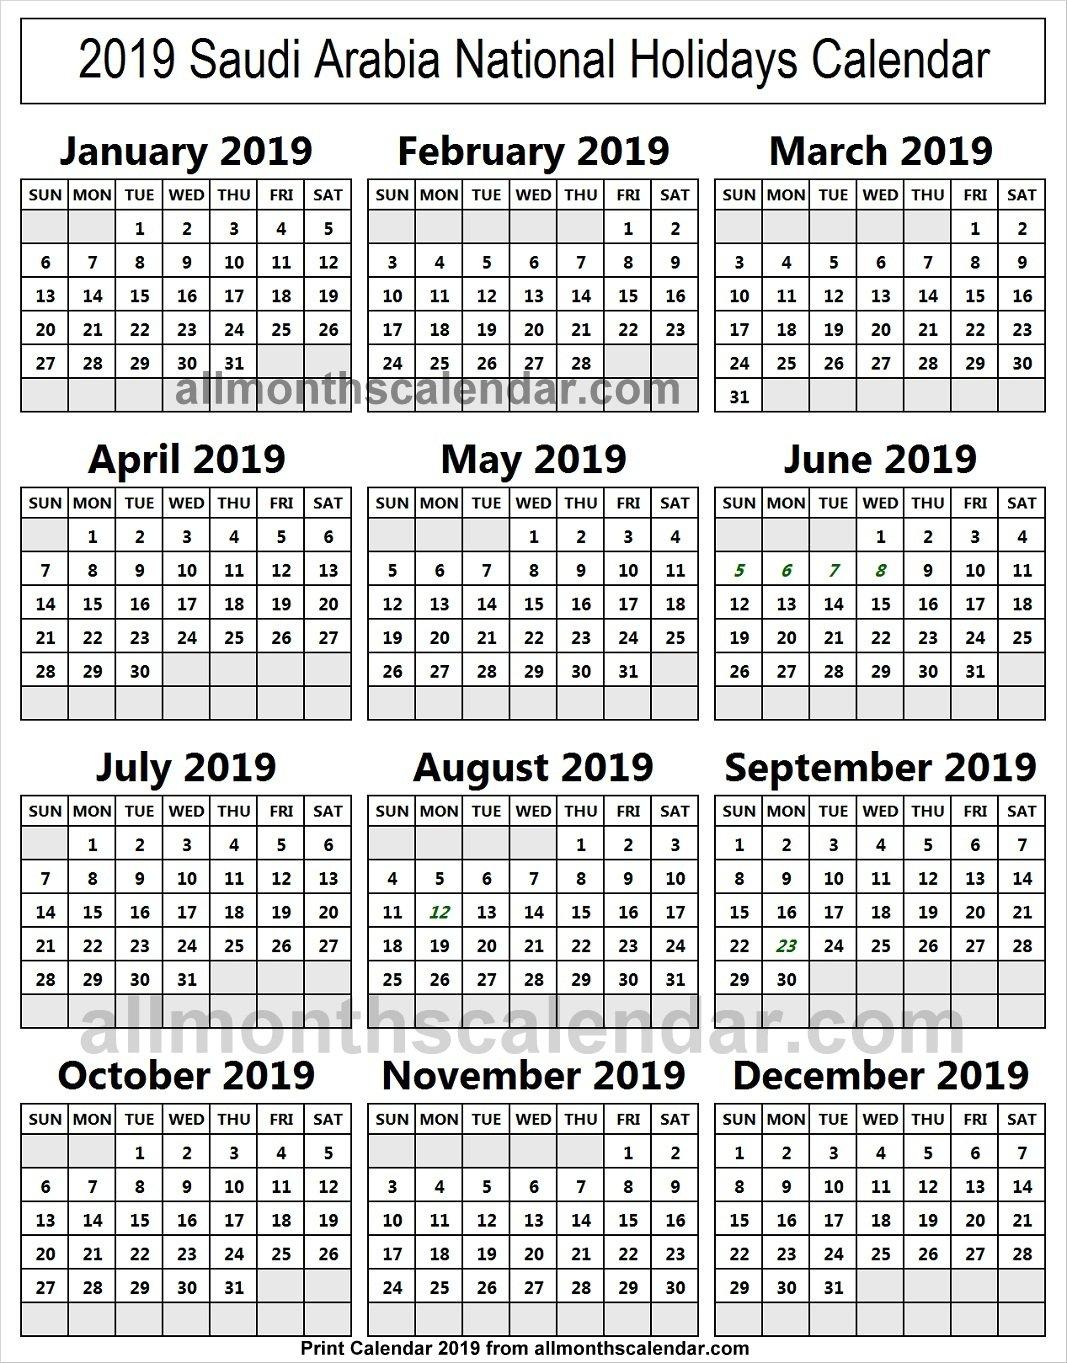 Saudi Arabia Holiday List 2019 Calendar | 2019 Saudi Arabia Calendar Calendar 2019 Ksa